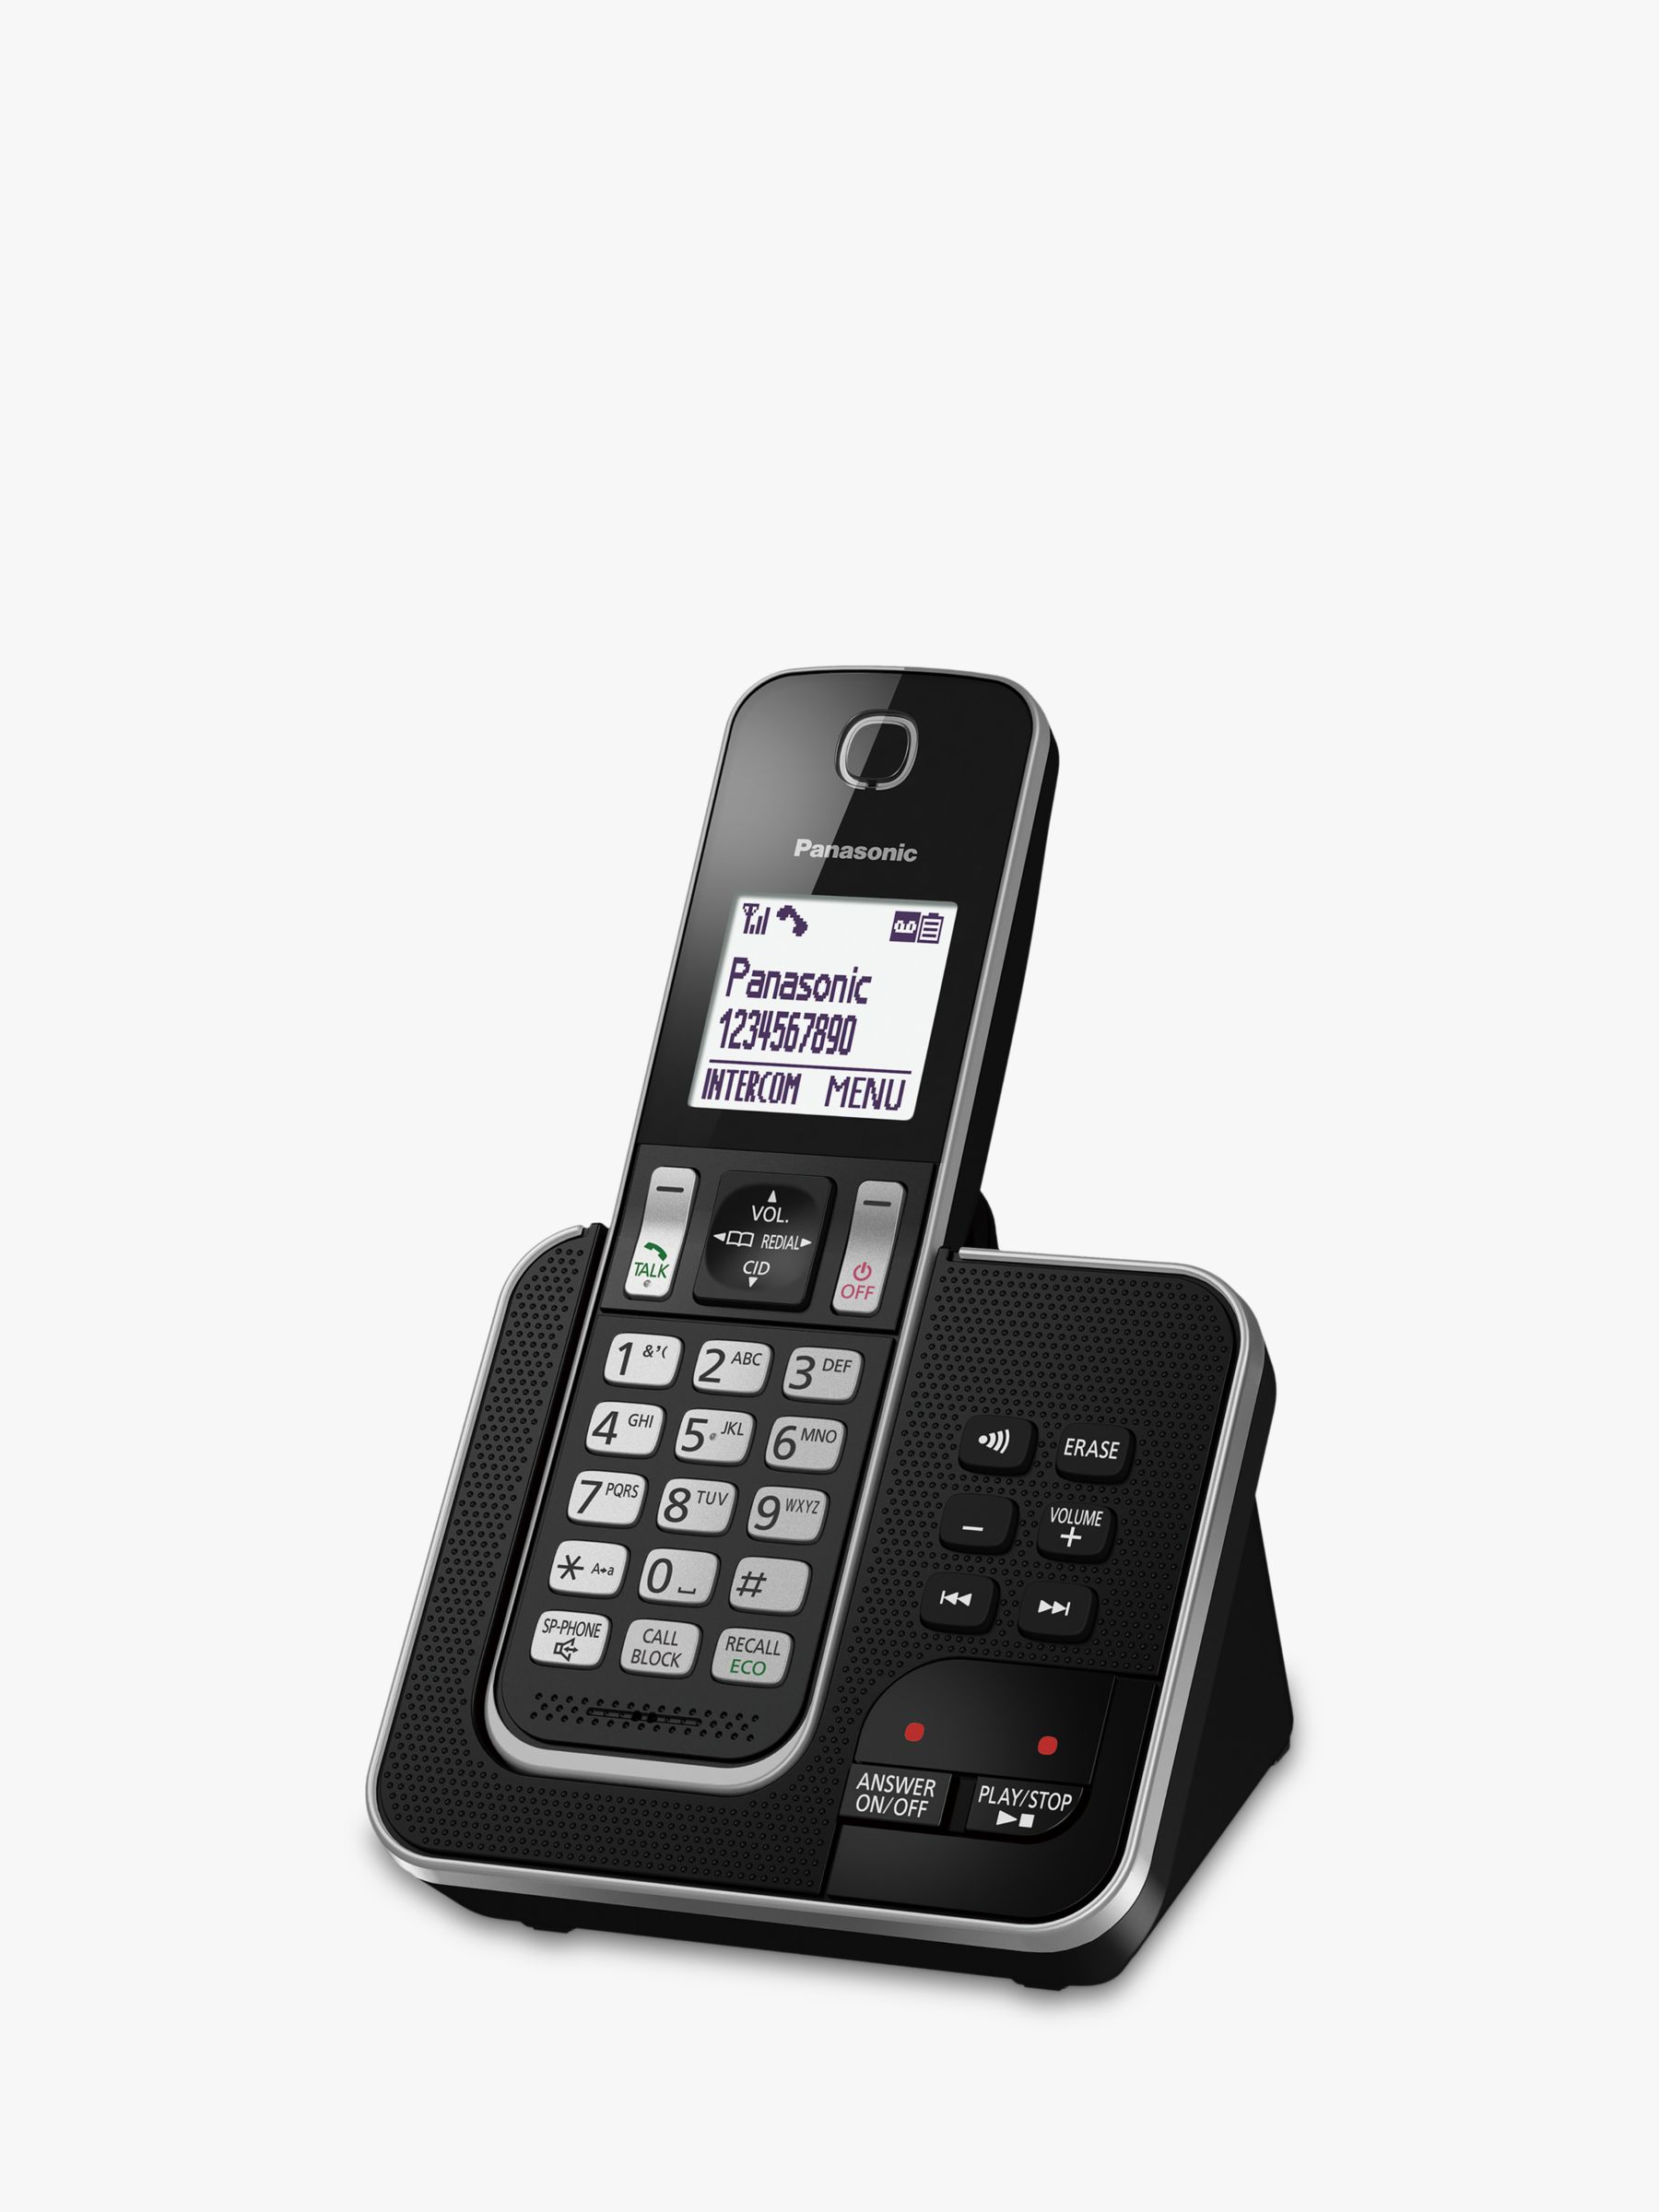 Panasonic Panasonic KX-TGD620EB Digital Cordless Telephone with Dedicated Nuisance Call Block Button and Answering Machine, Single DECT